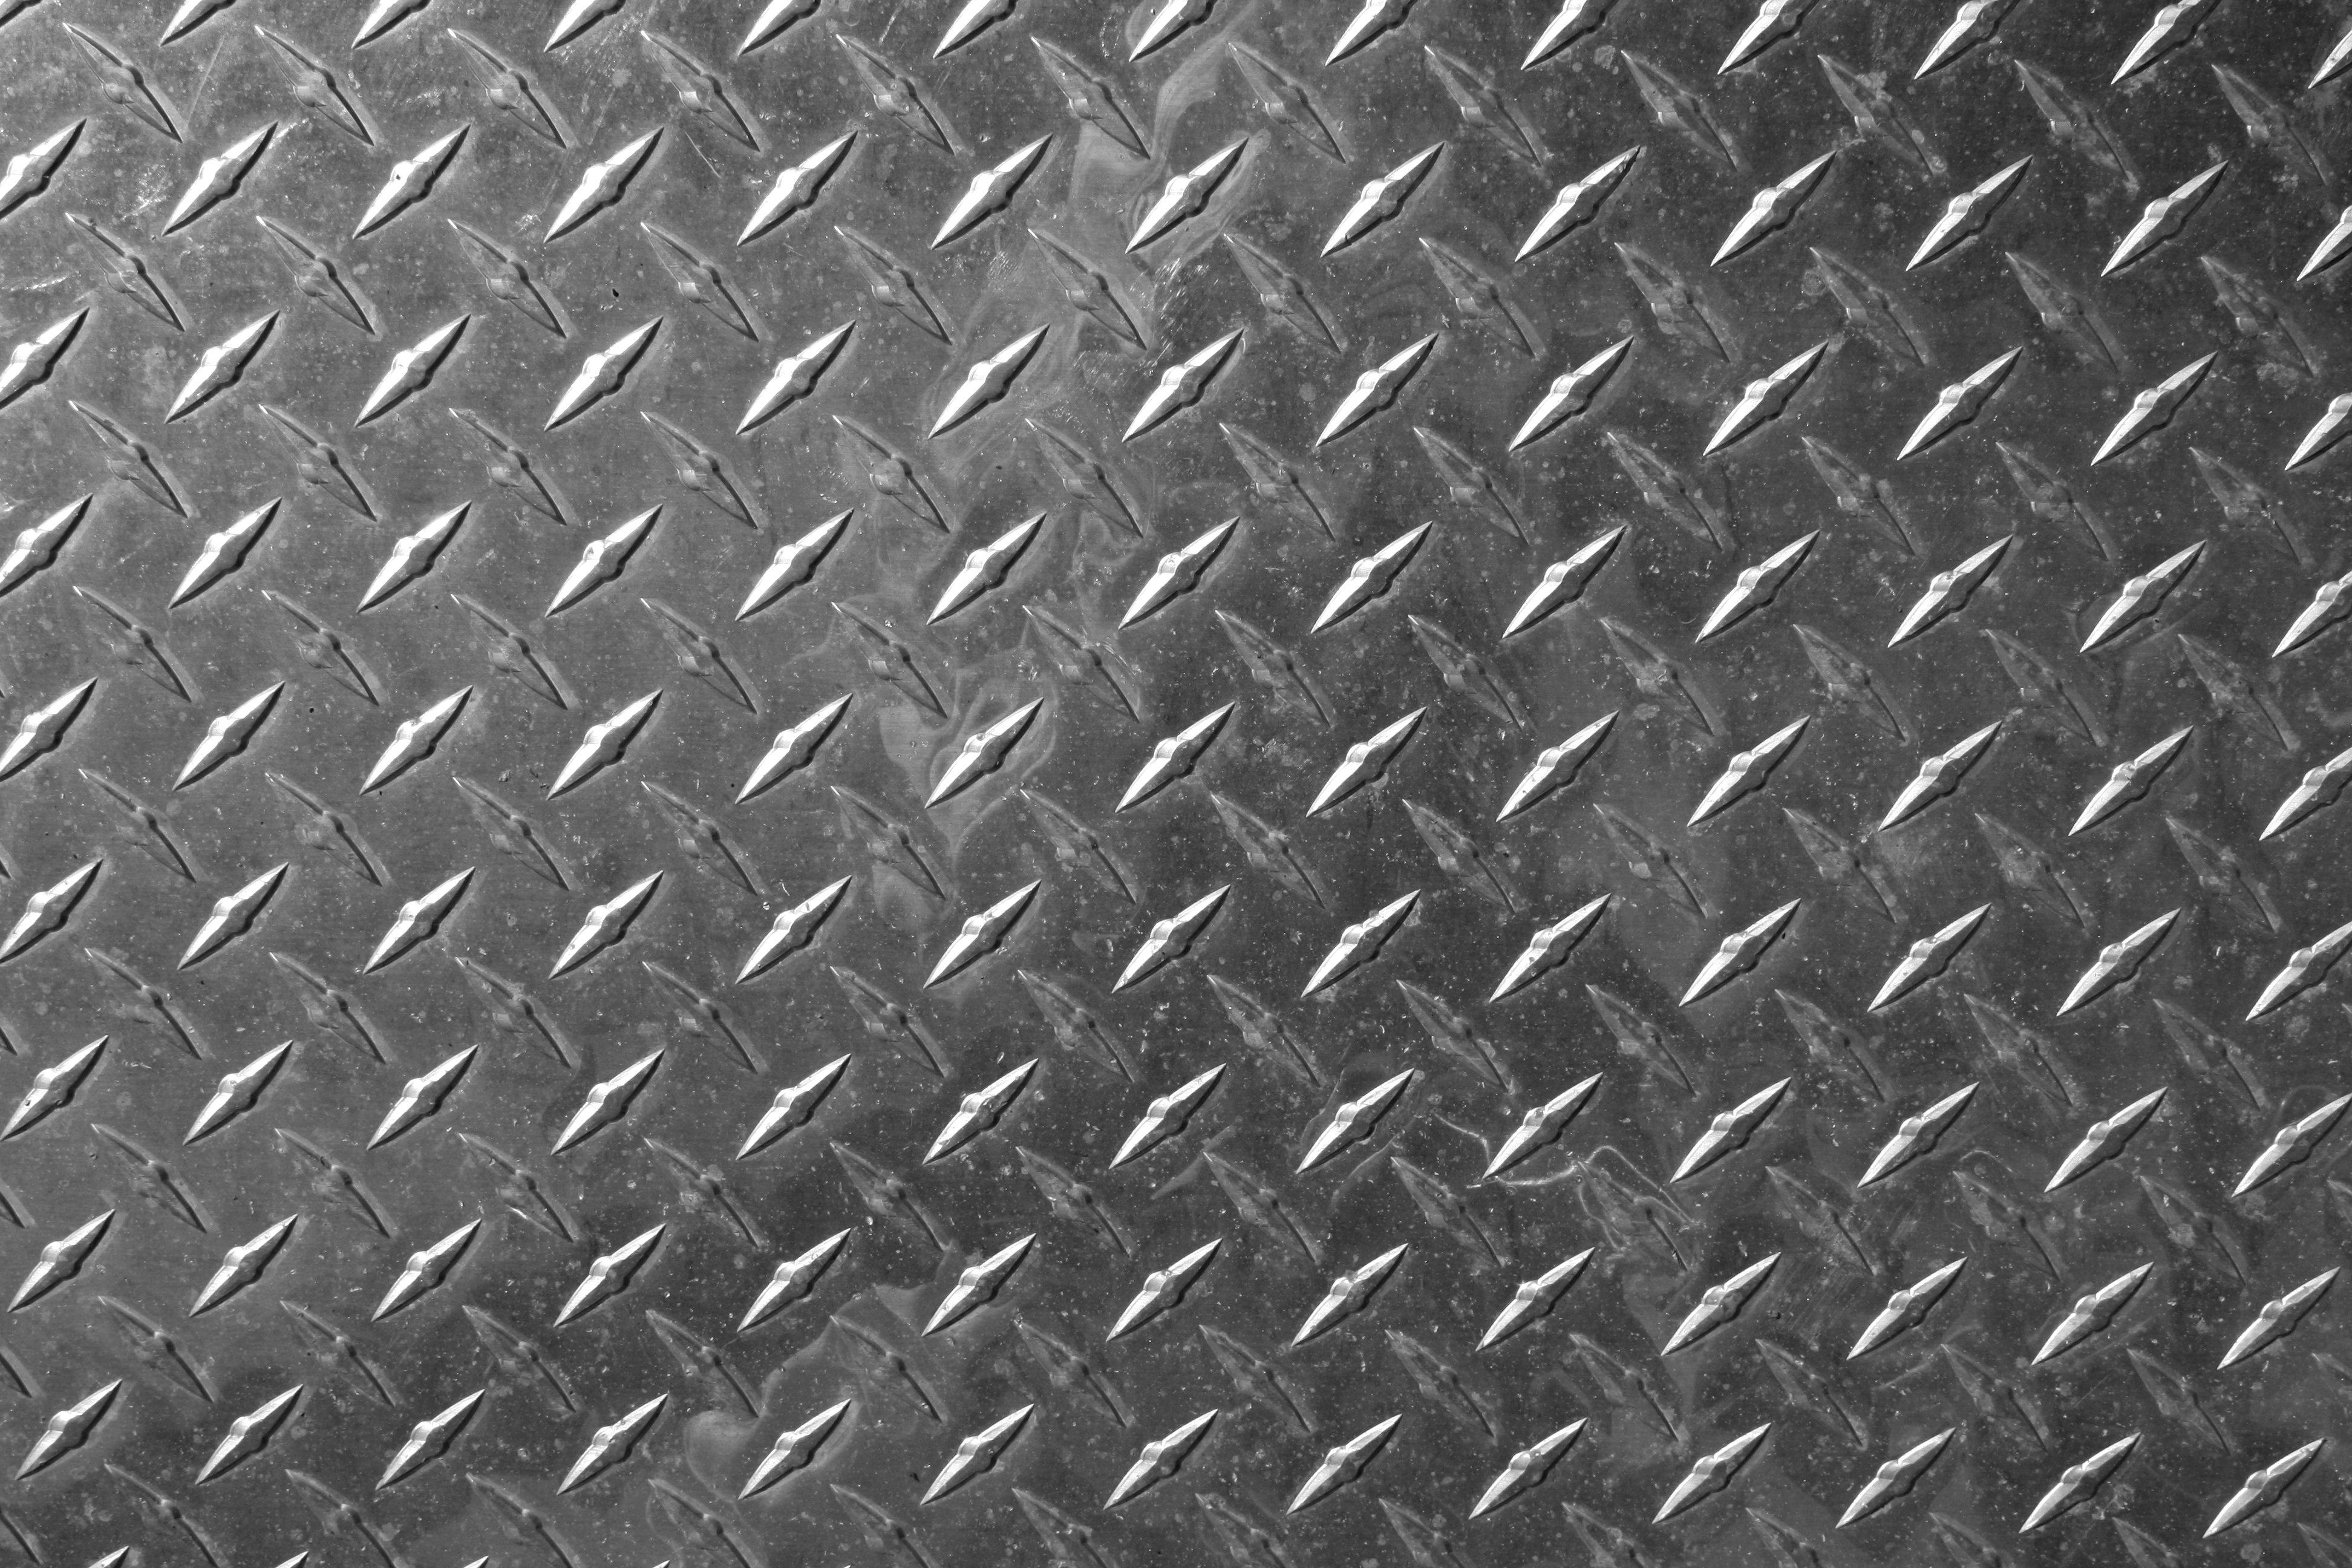 Silver Textured Sheet Metal Texture Picture Photograph Photos 3888x2592